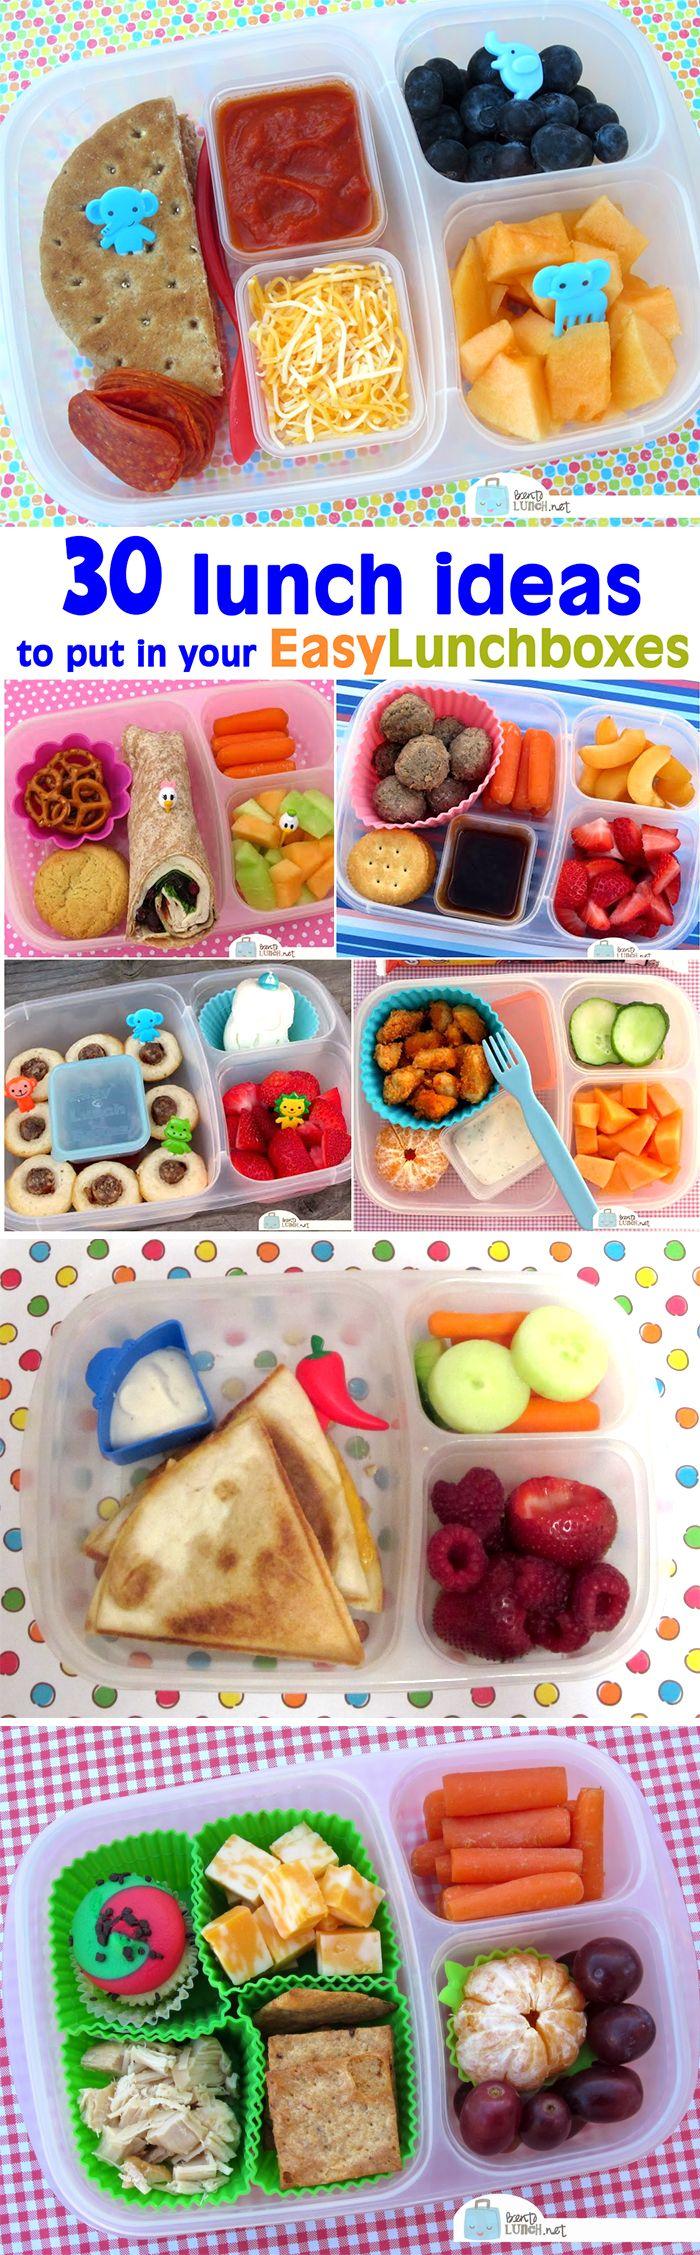 30 Lunch Ideas to Put in Your EasyLunchboxes #schoollunchideasforkids